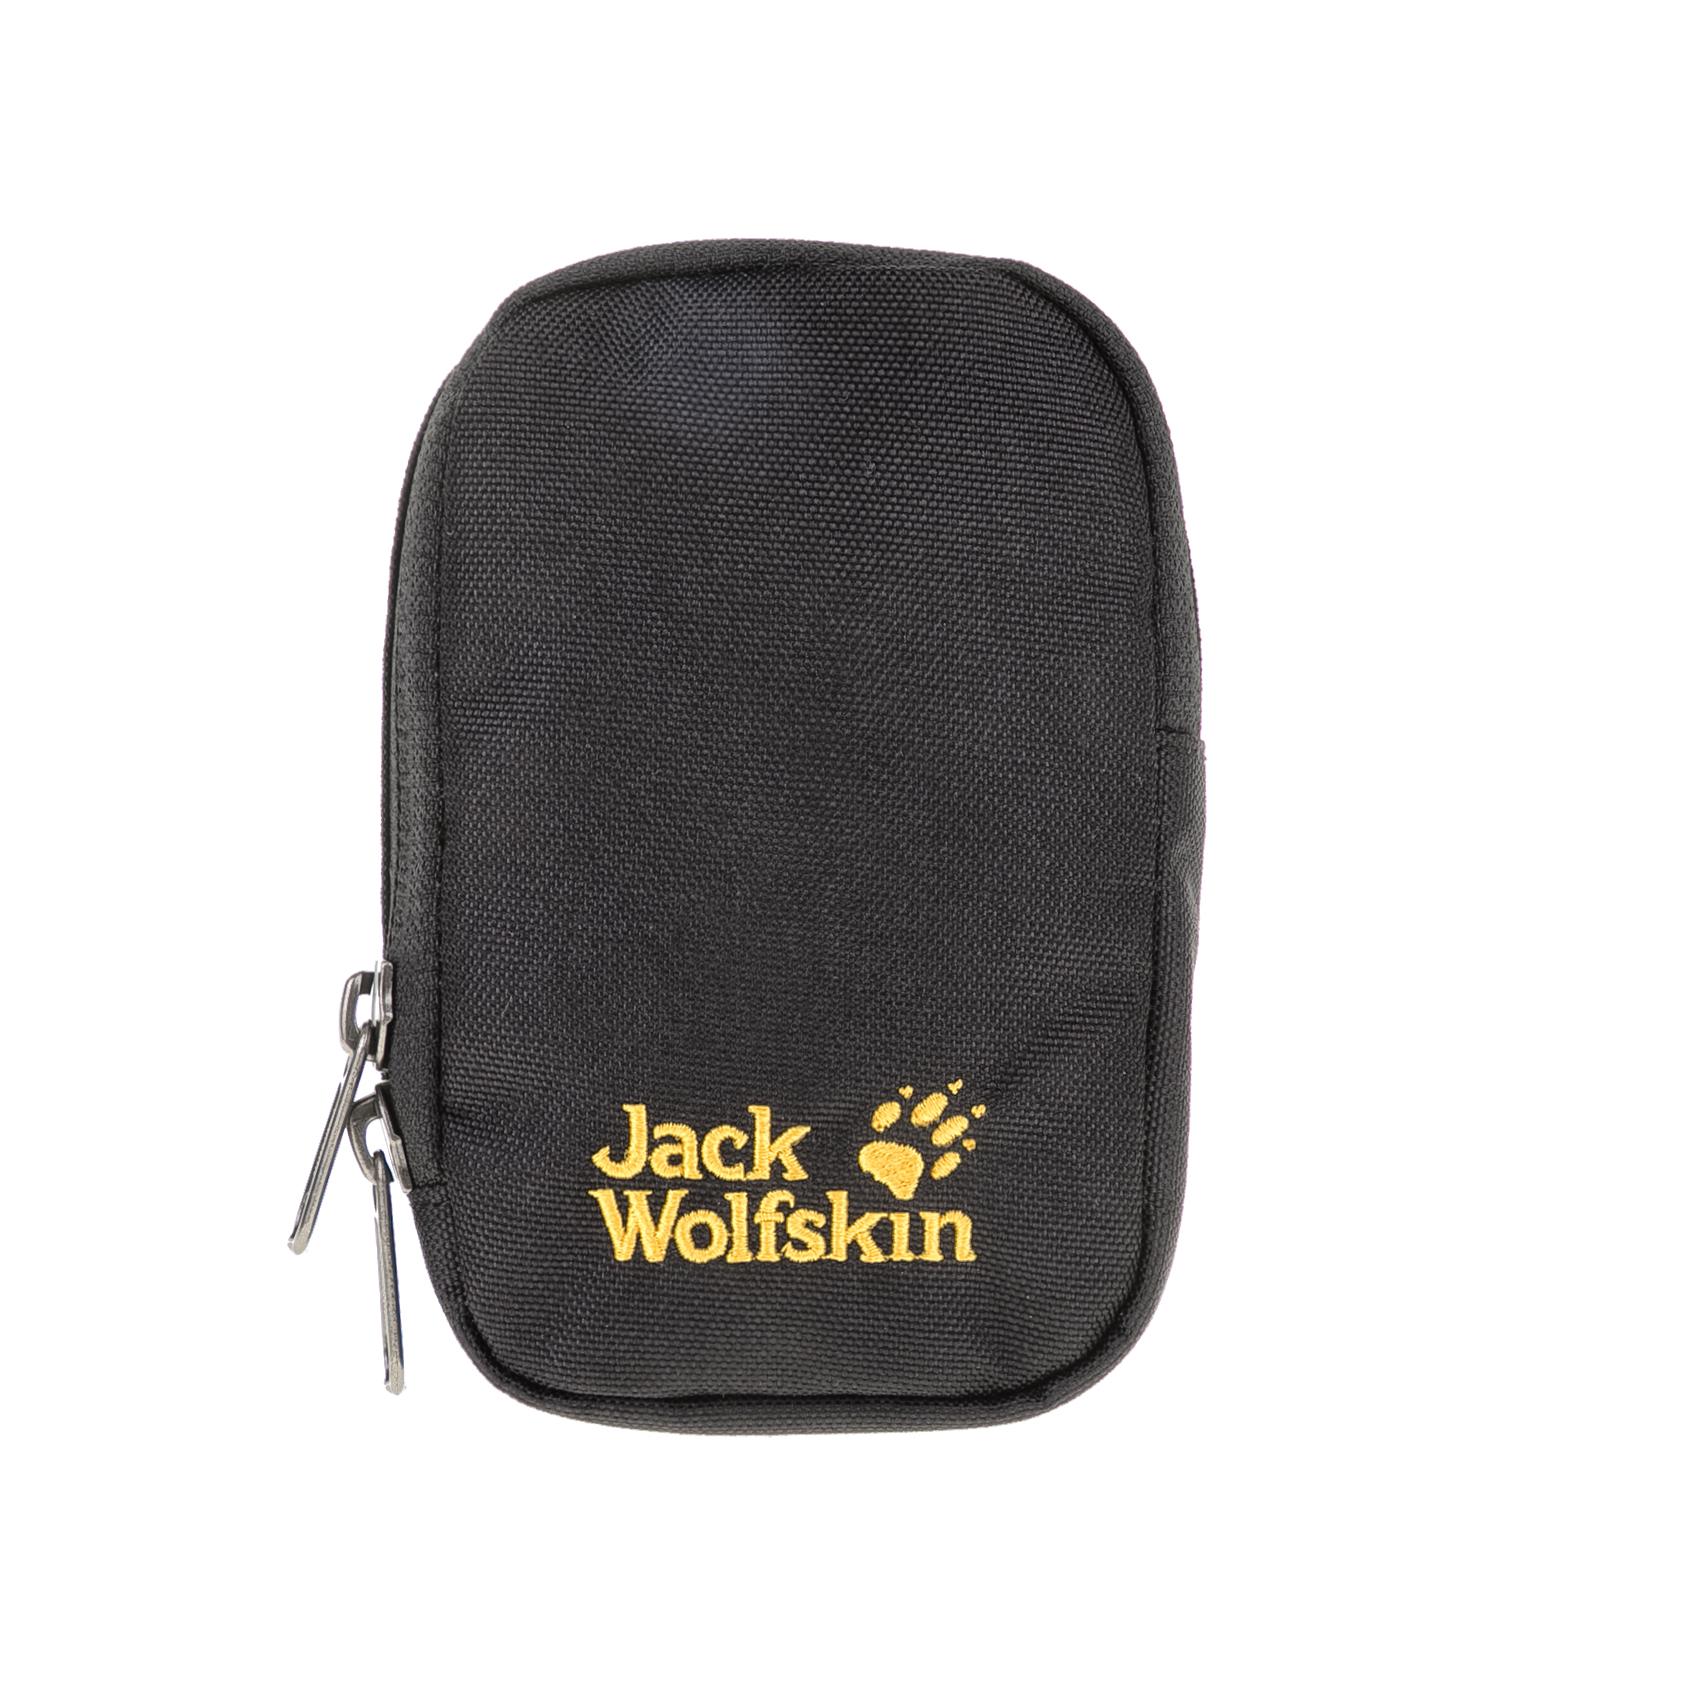 JACK WOLFSKIN - Θήκη ηλεκτρονικών συσκευών GADGET POUCH S POUCH EQUIPMENT μαύρη γυναικεία αξεσουάρ αθλητικά είδη εξοπλισμός